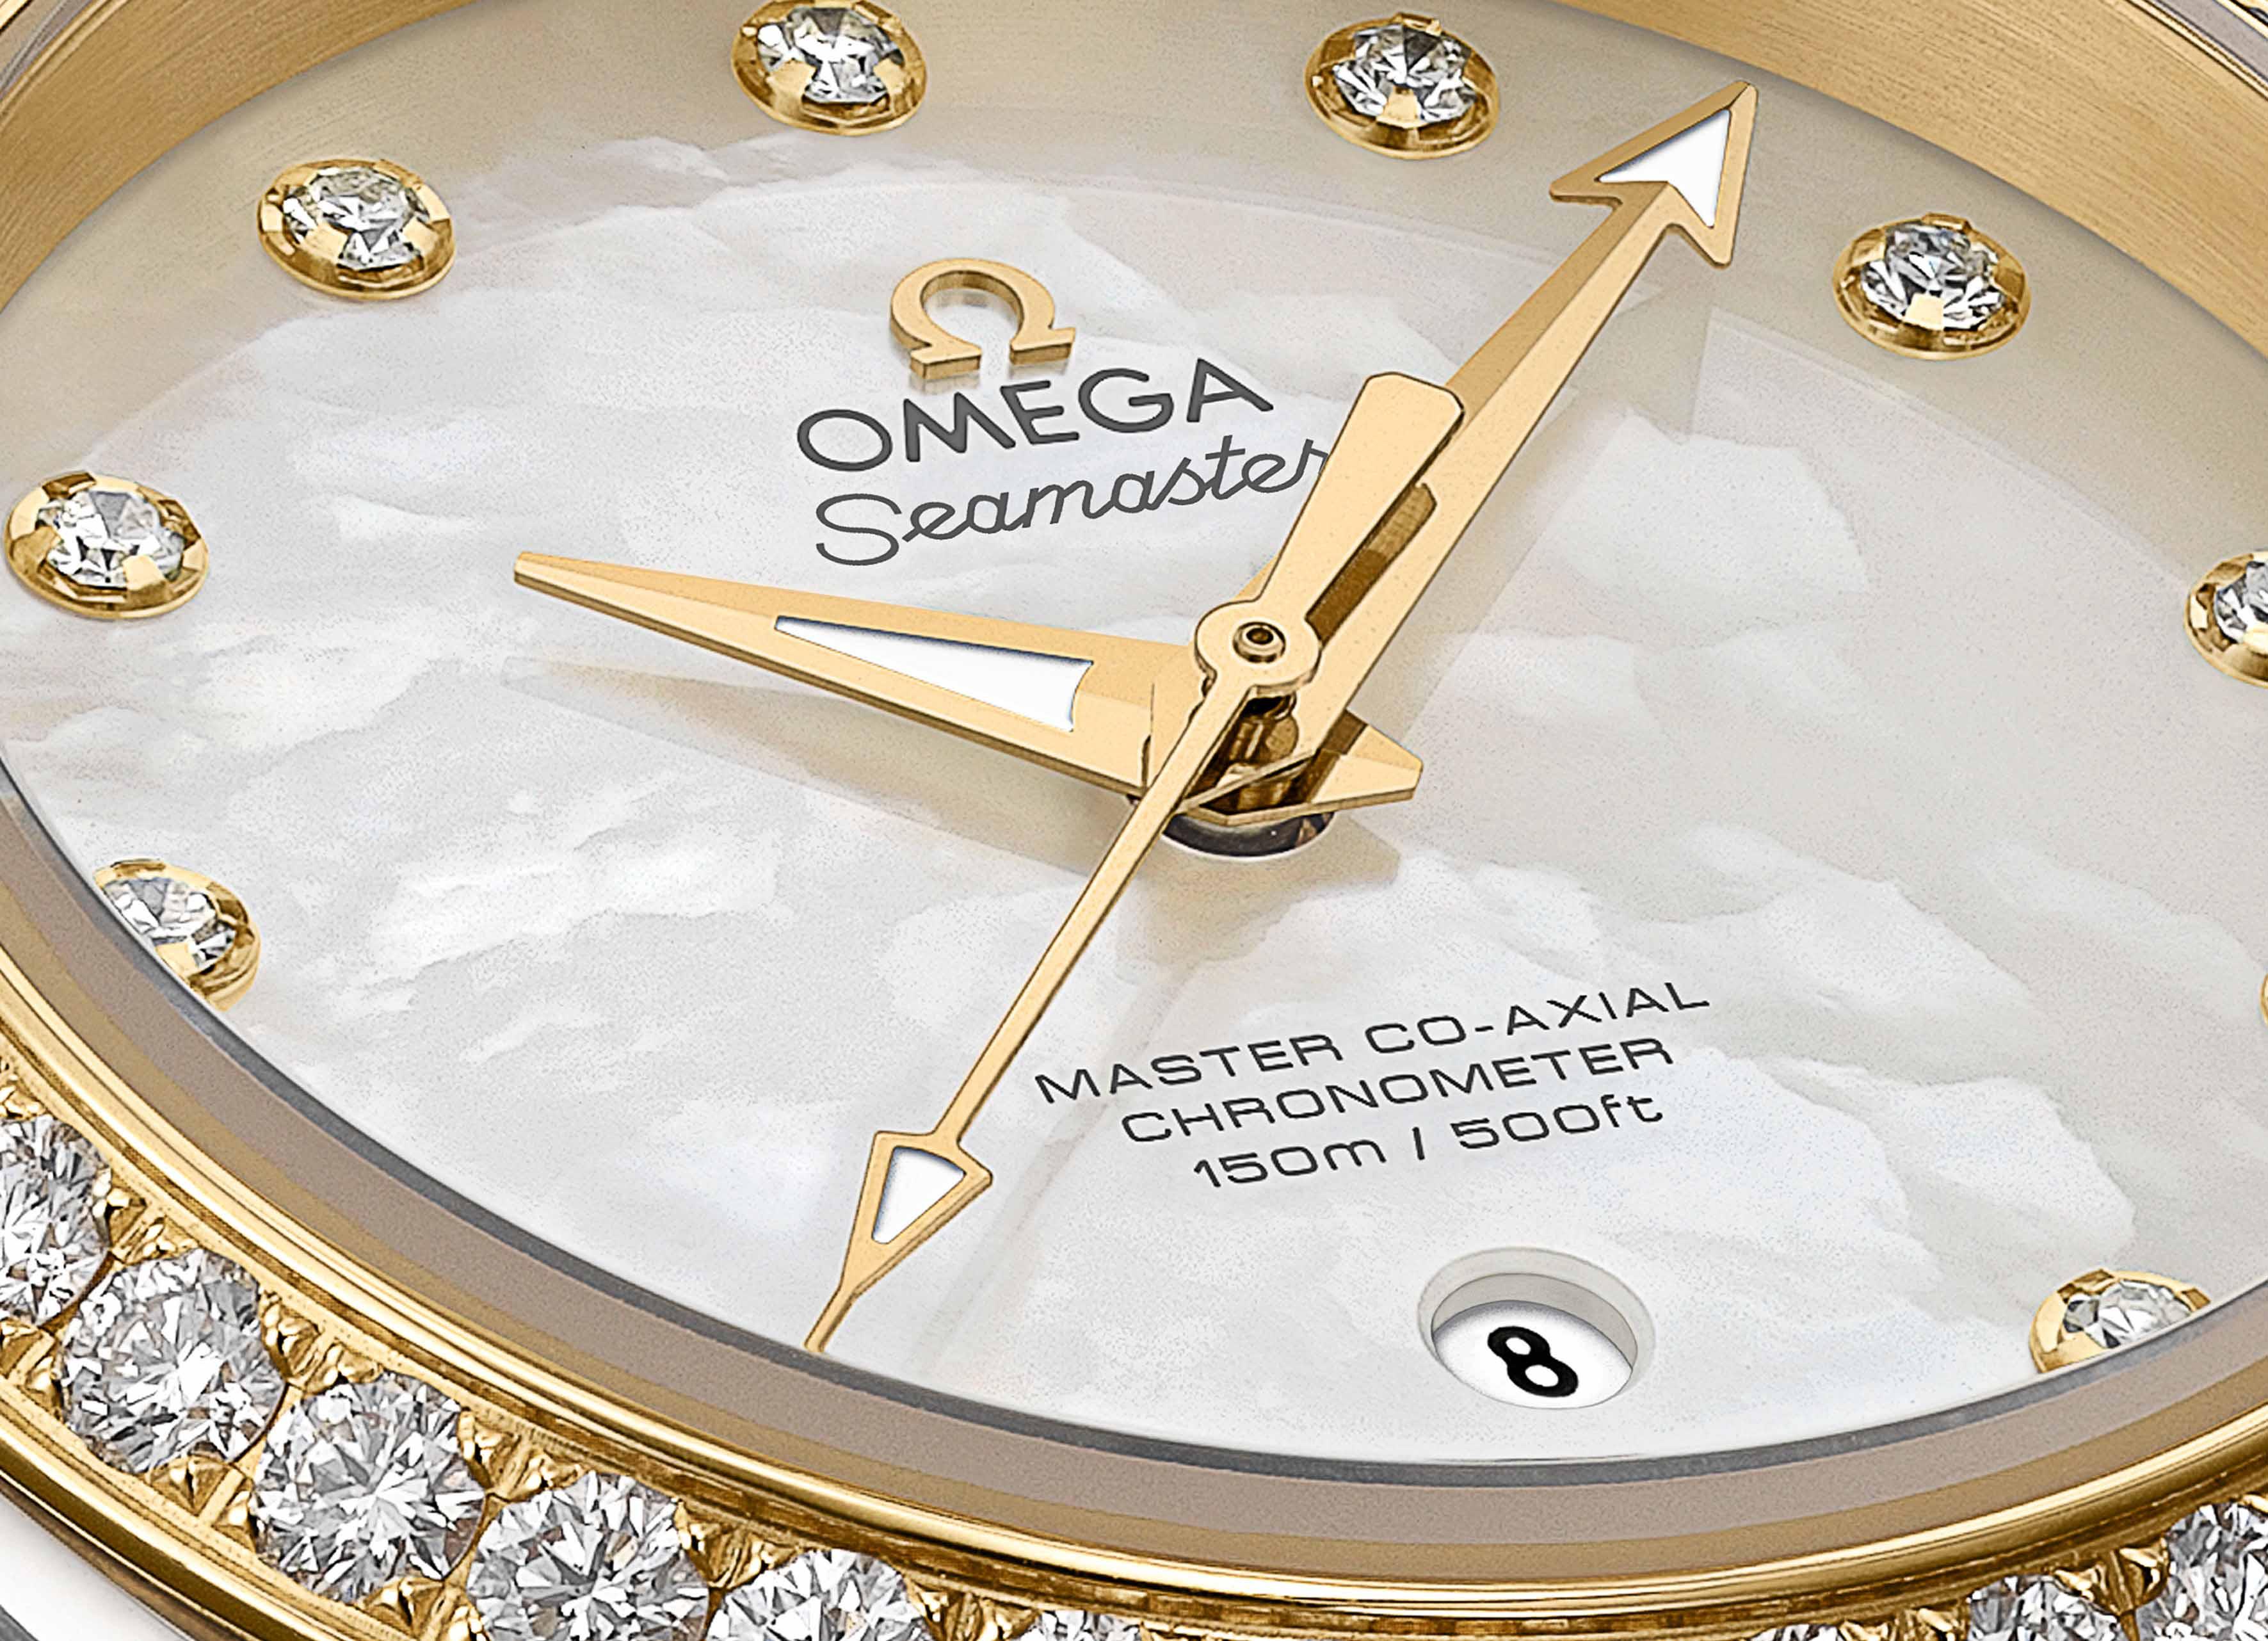 Seamaster_Aqua Terra_231.25.39.21.55.002_close up dial (2)